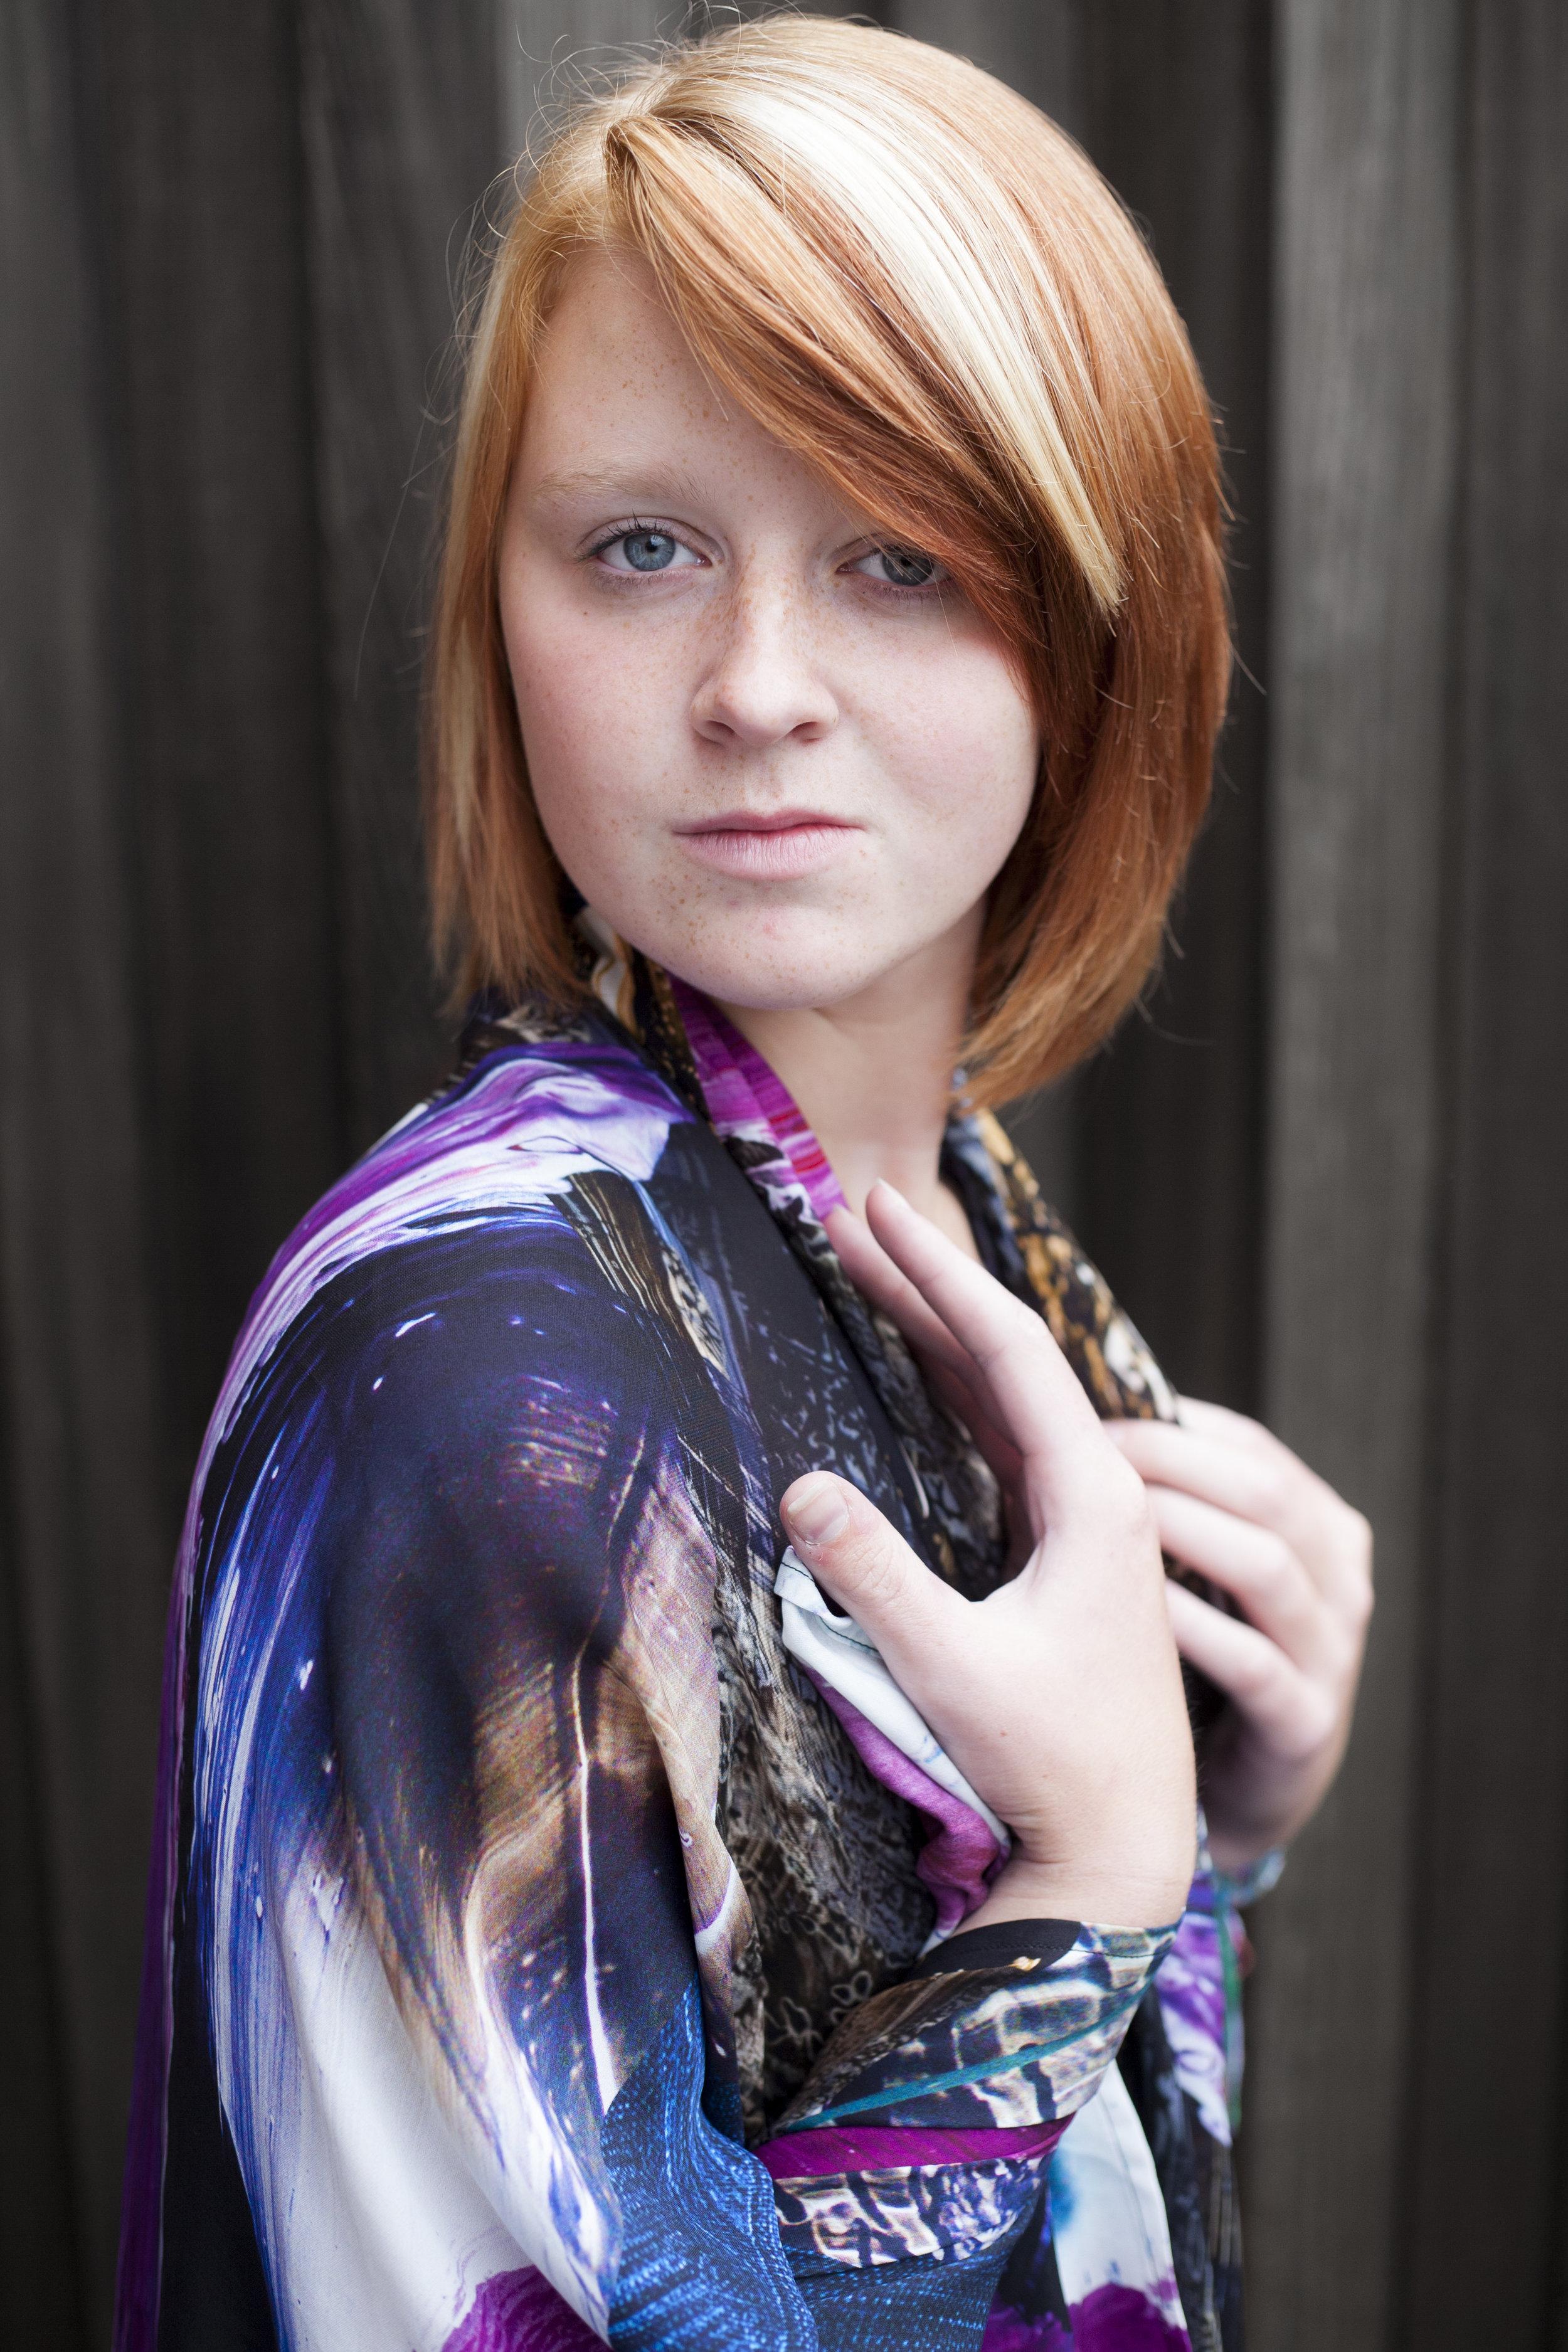 6.Tamara met sjaal.jpg